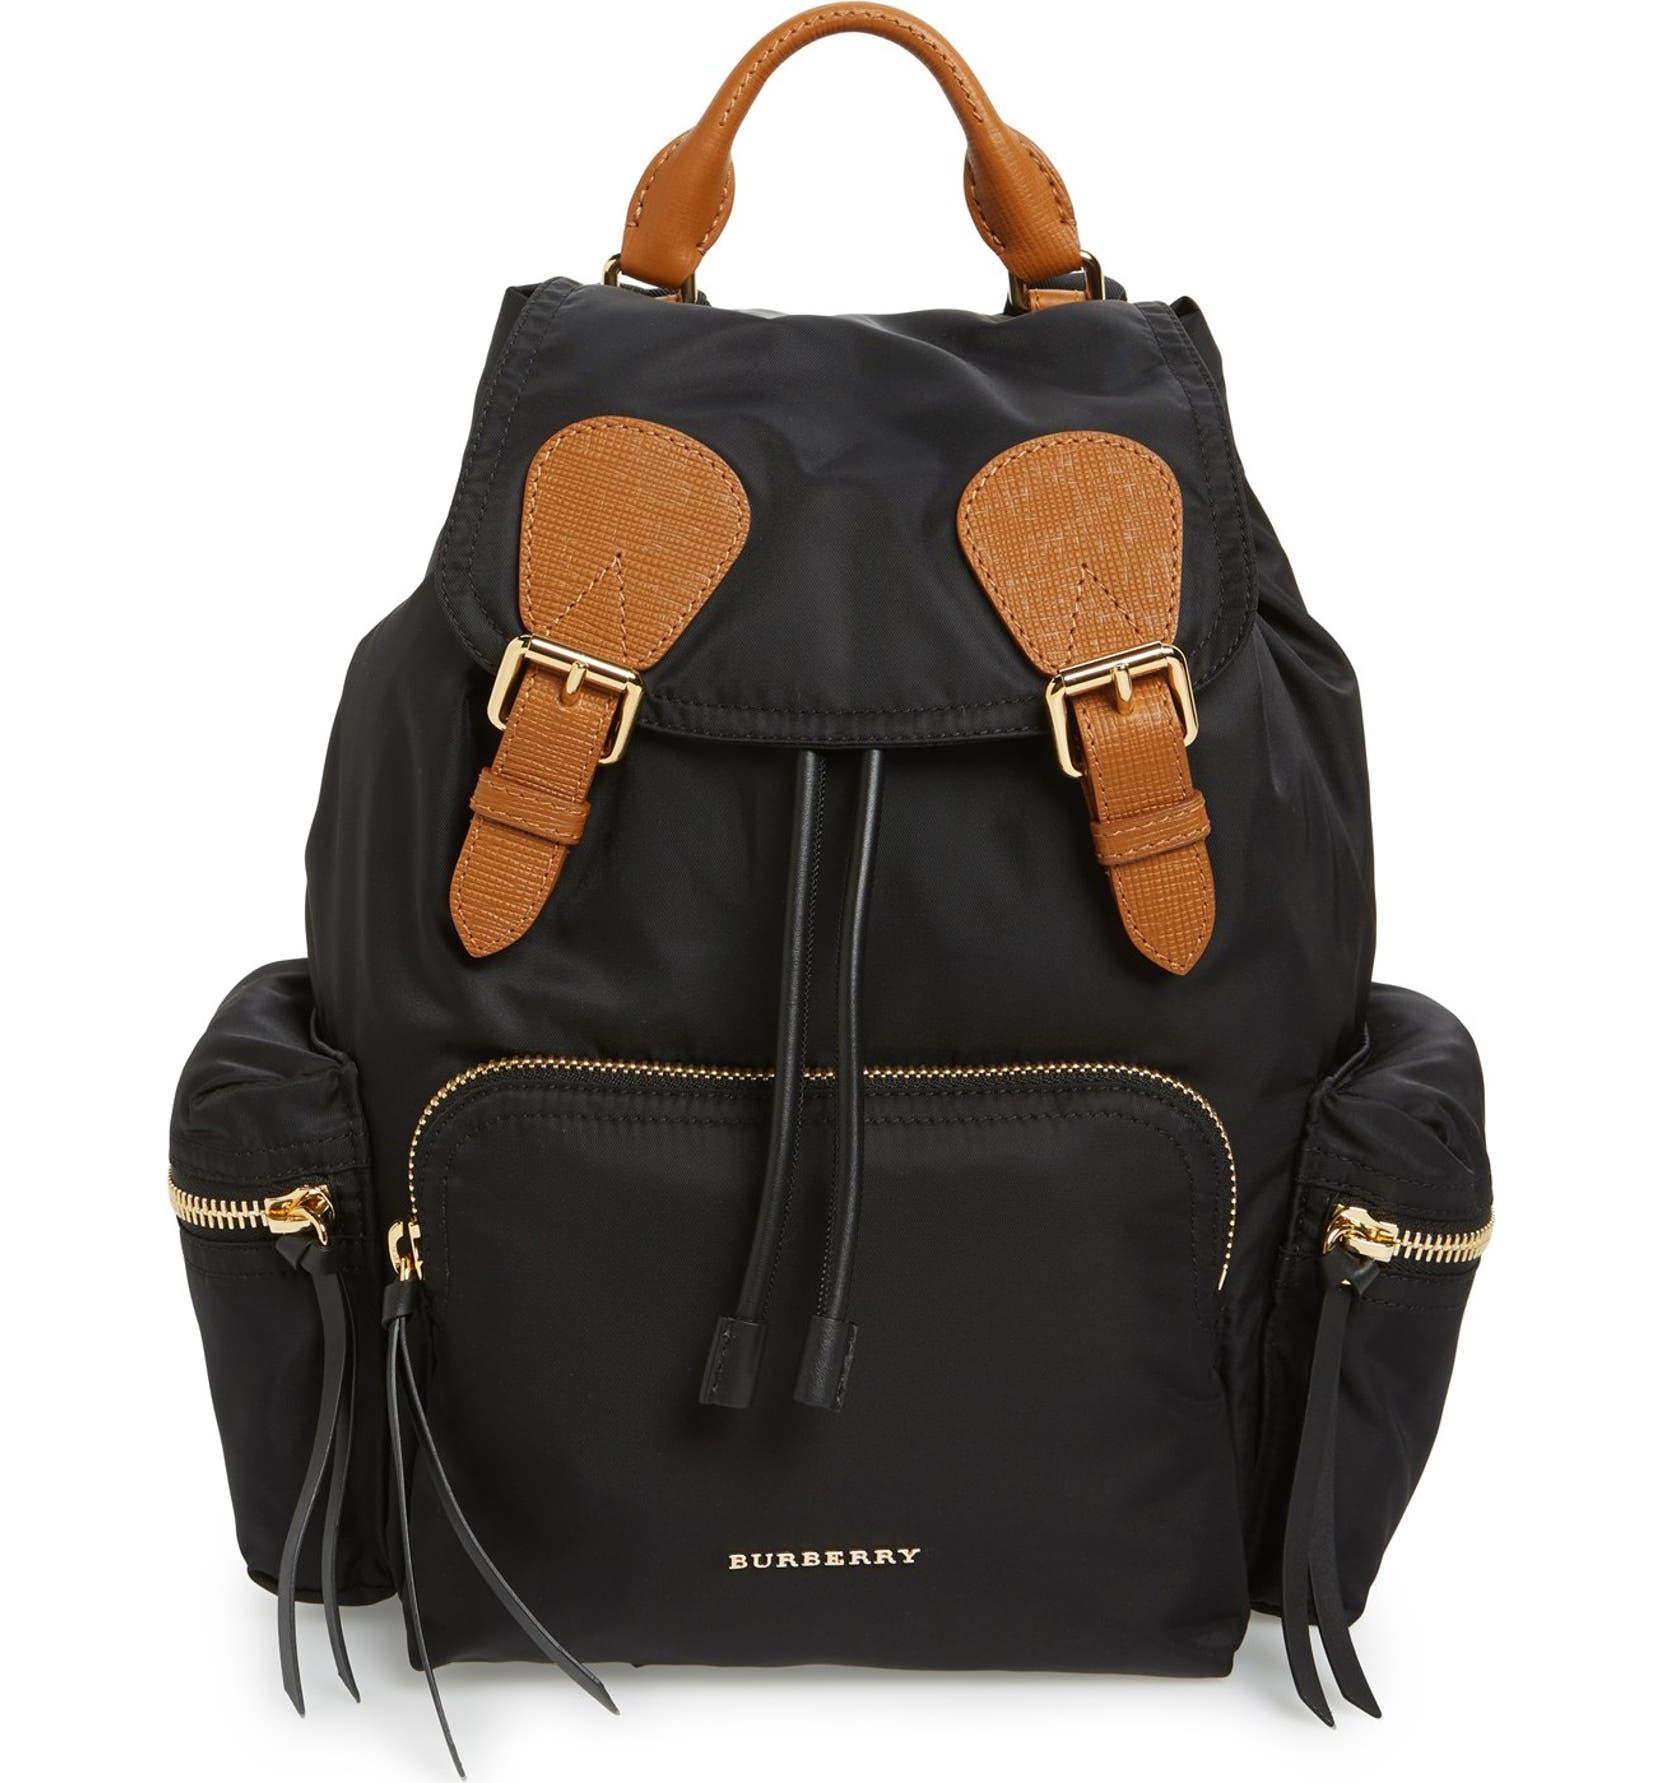 Burberry  Medium Runway Rucksack  Nylon Backpack  fcfa0003de0a7